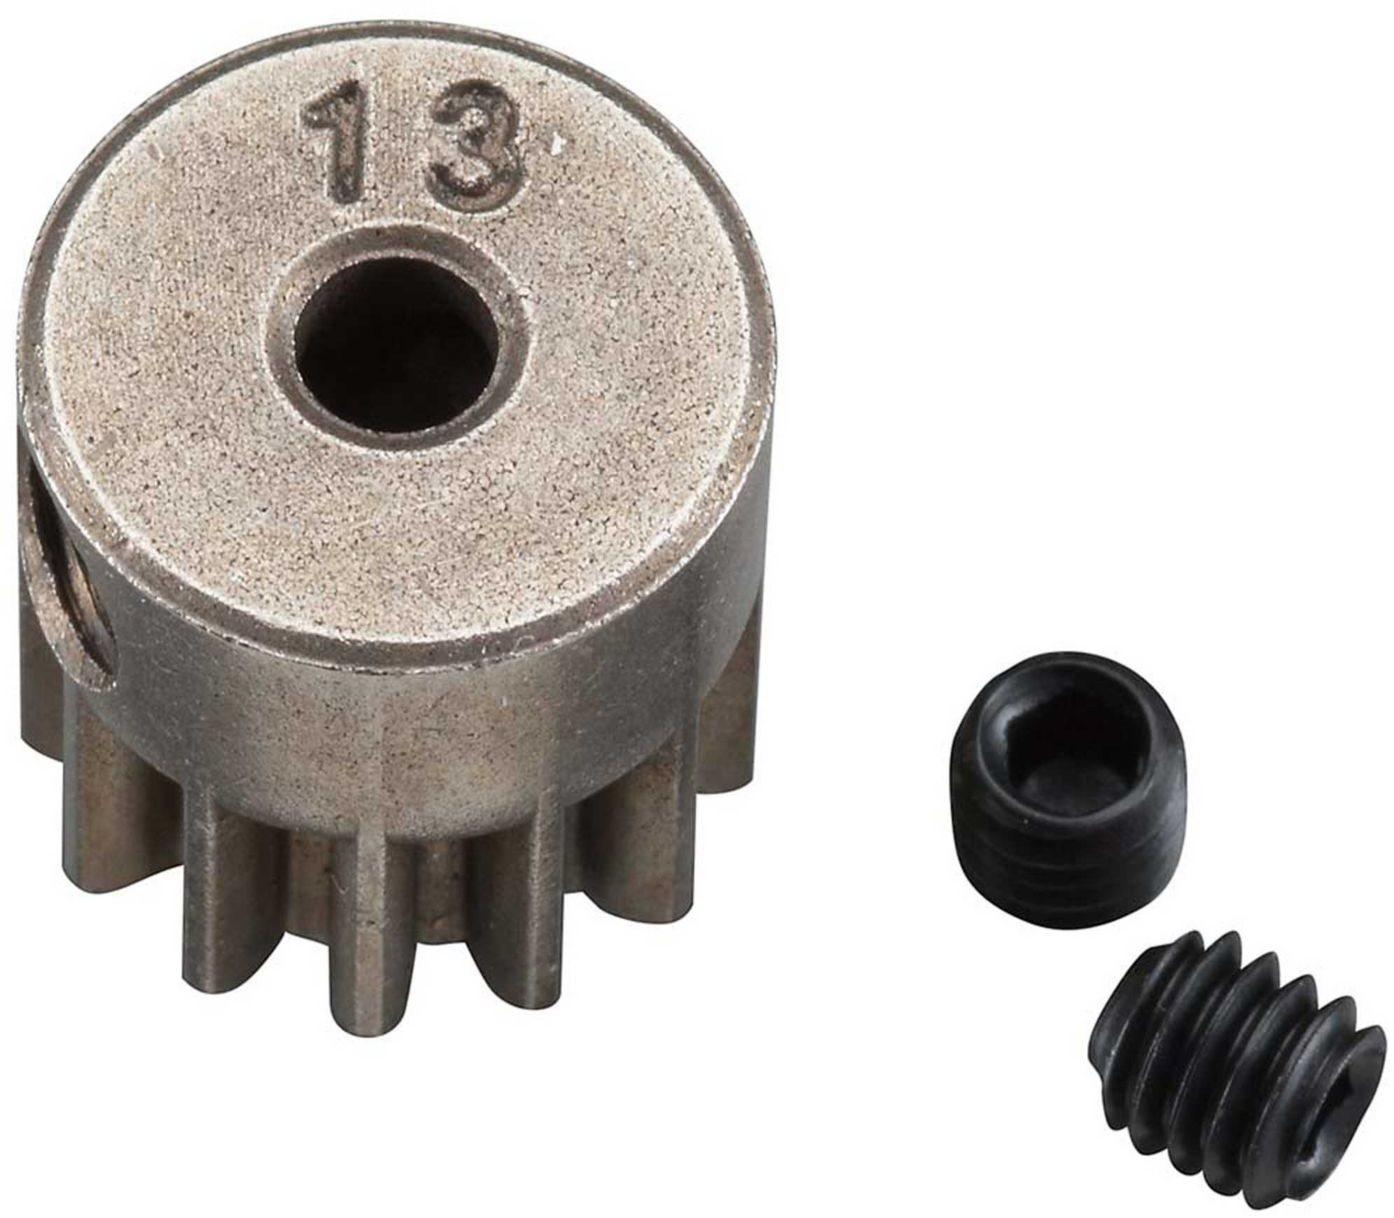 Axial Pinion Gear 32P 13T Steel 3mm Motor Shaft